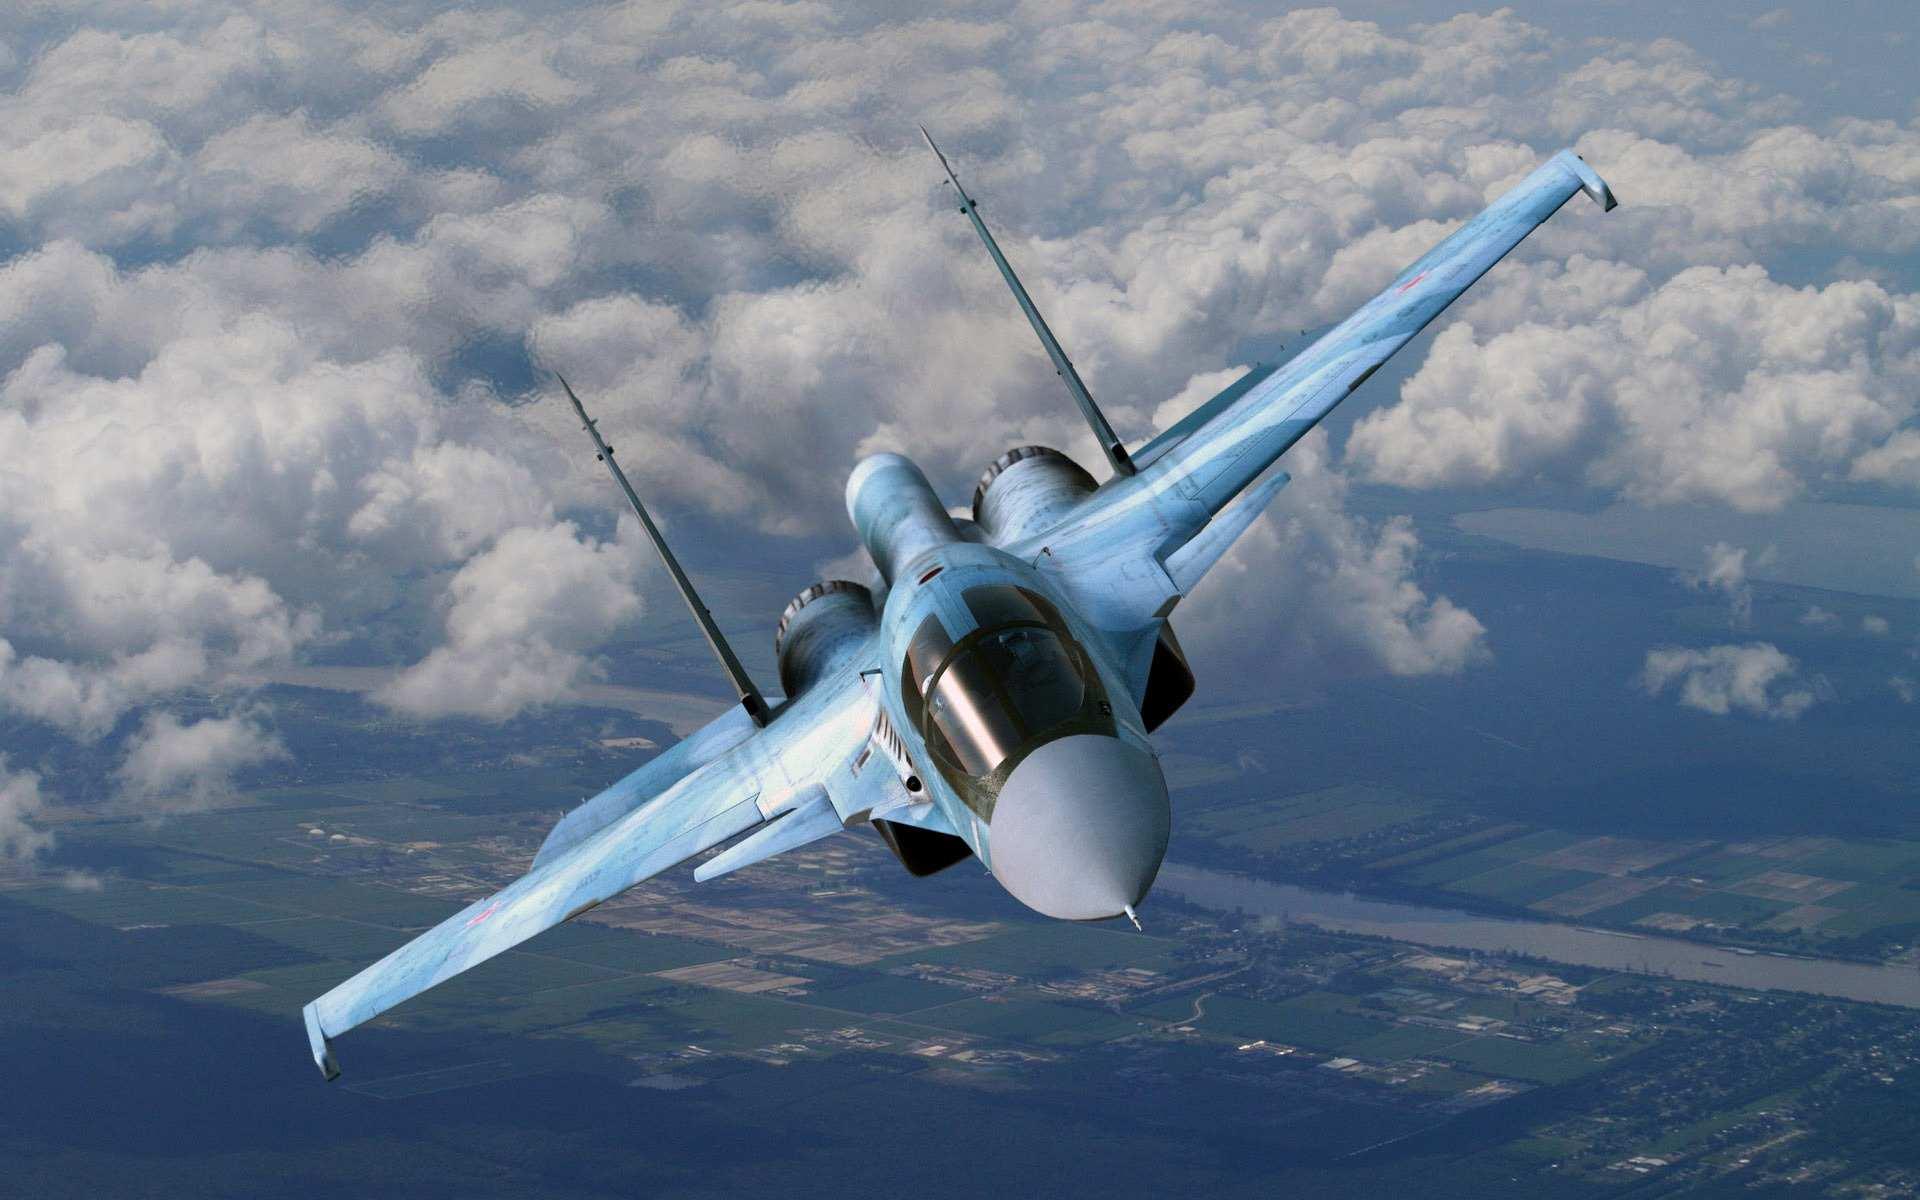 США признали успех операции ВКС РФ в Сирии | Русская весна